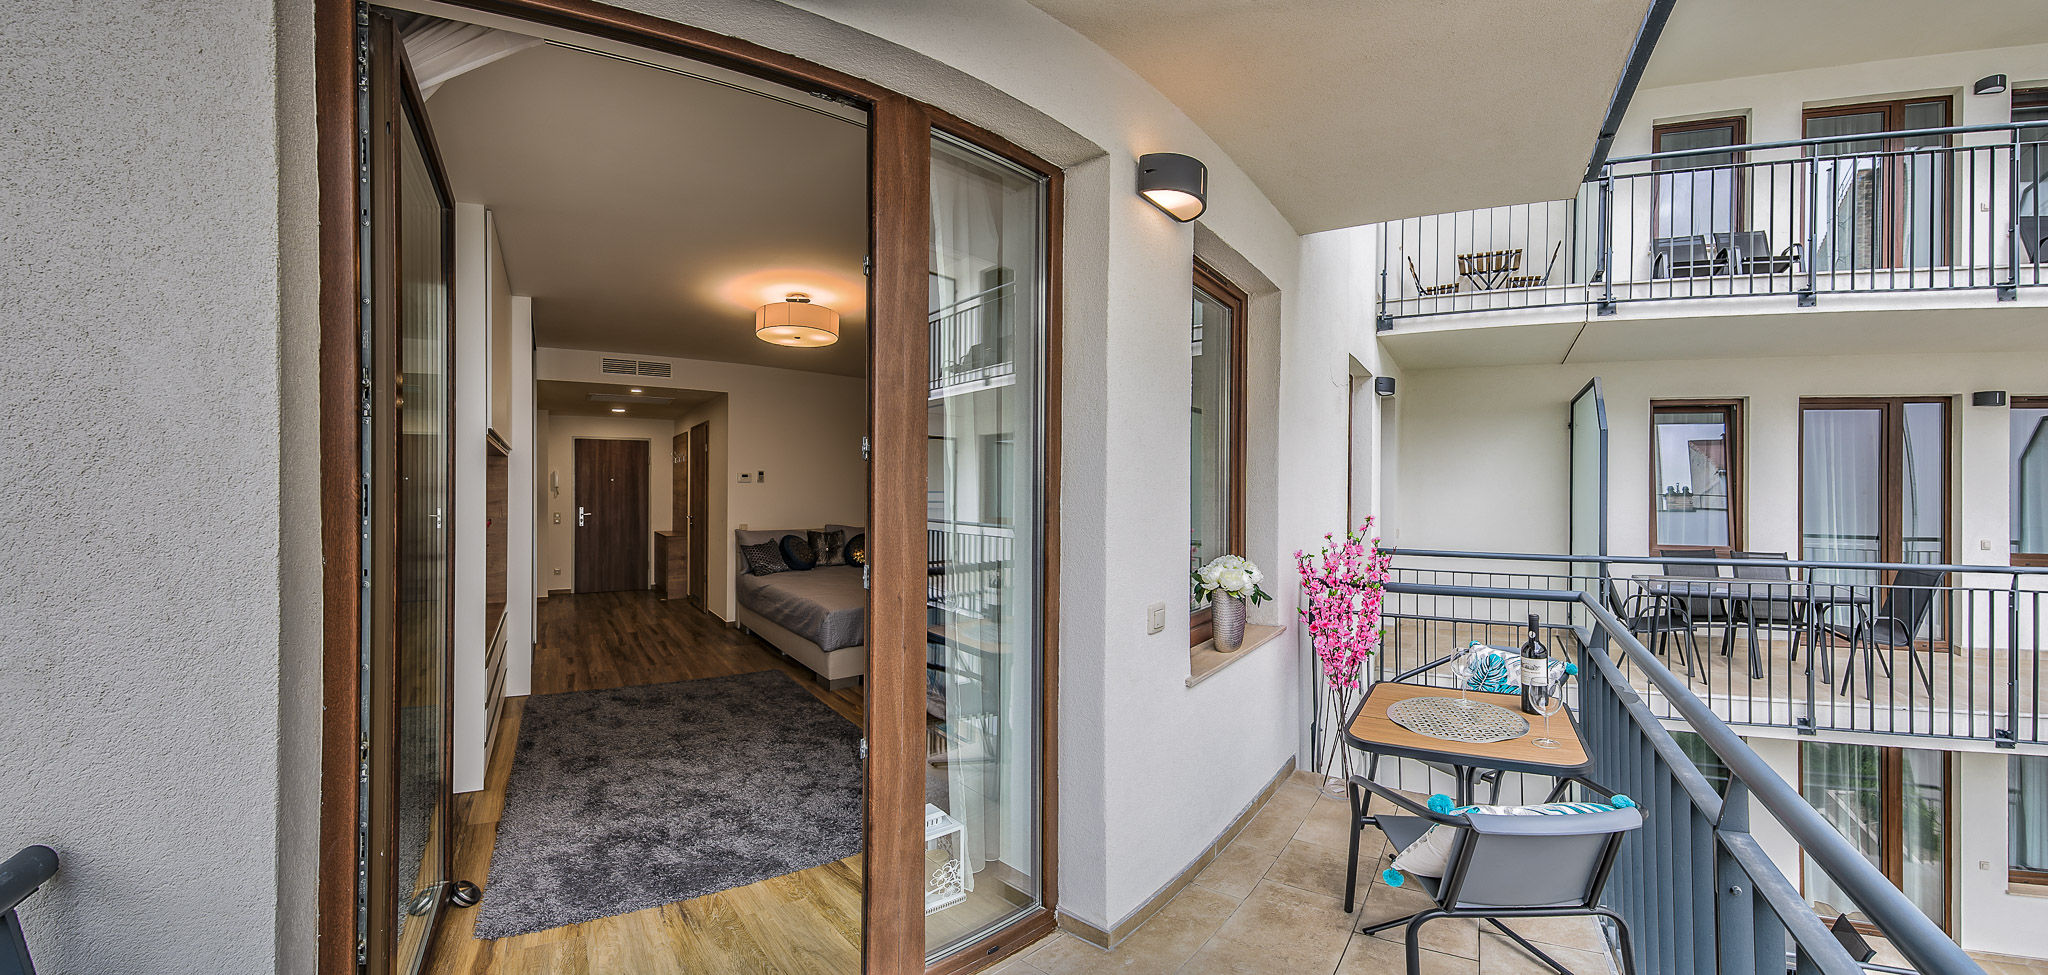 Studio Lux 2 - Art Homes Budapest